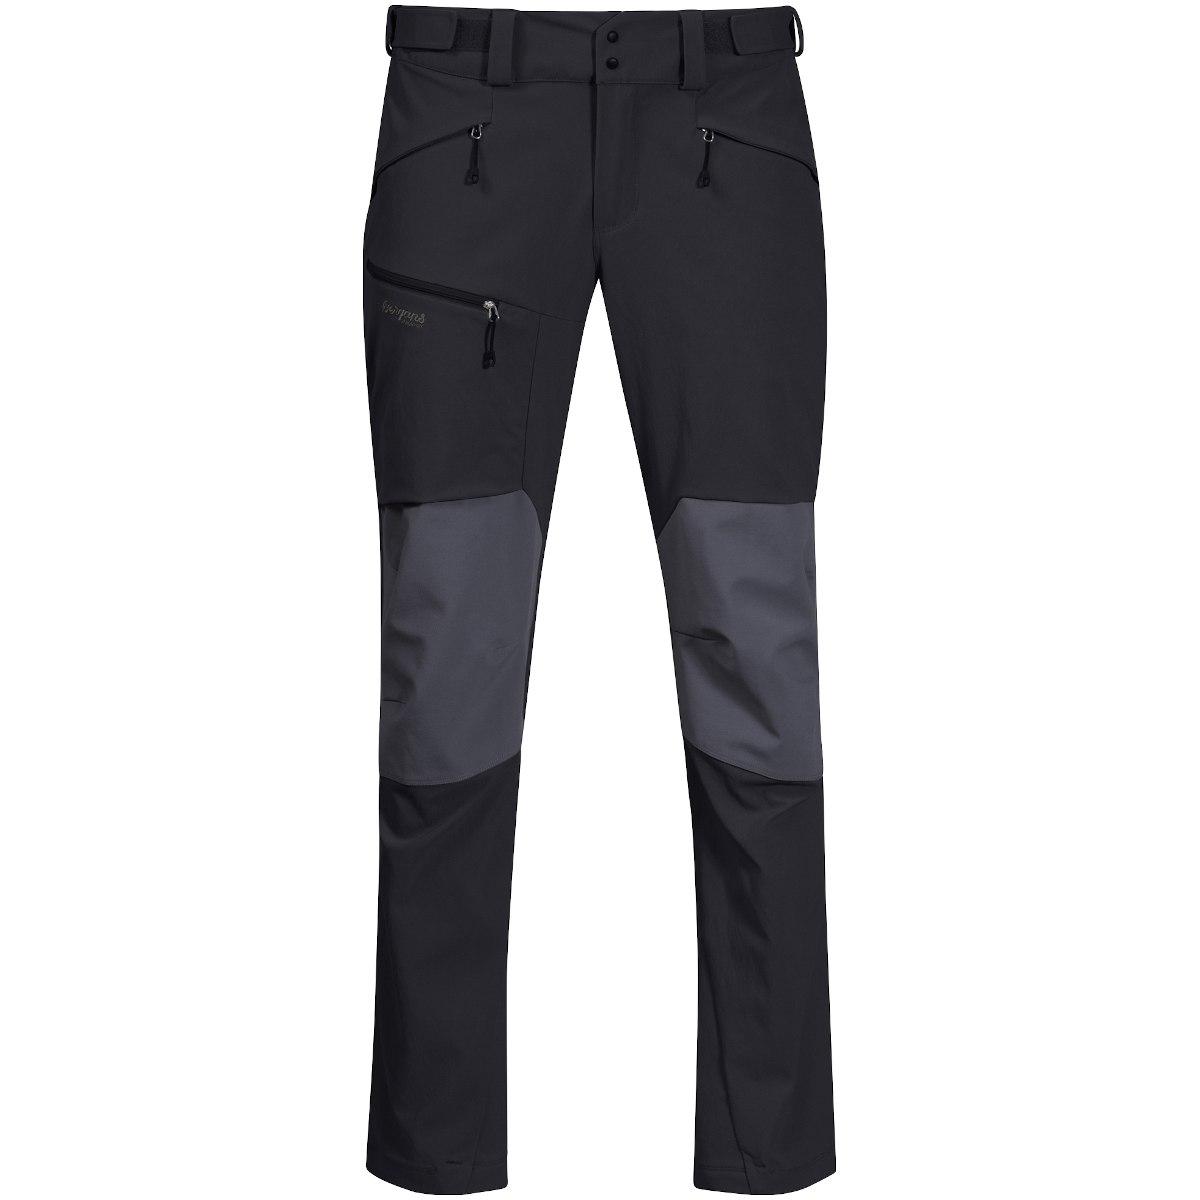 Bergans Rabot 365 Hybrid Pants - solid charcoal/solid dark grey/silver grey